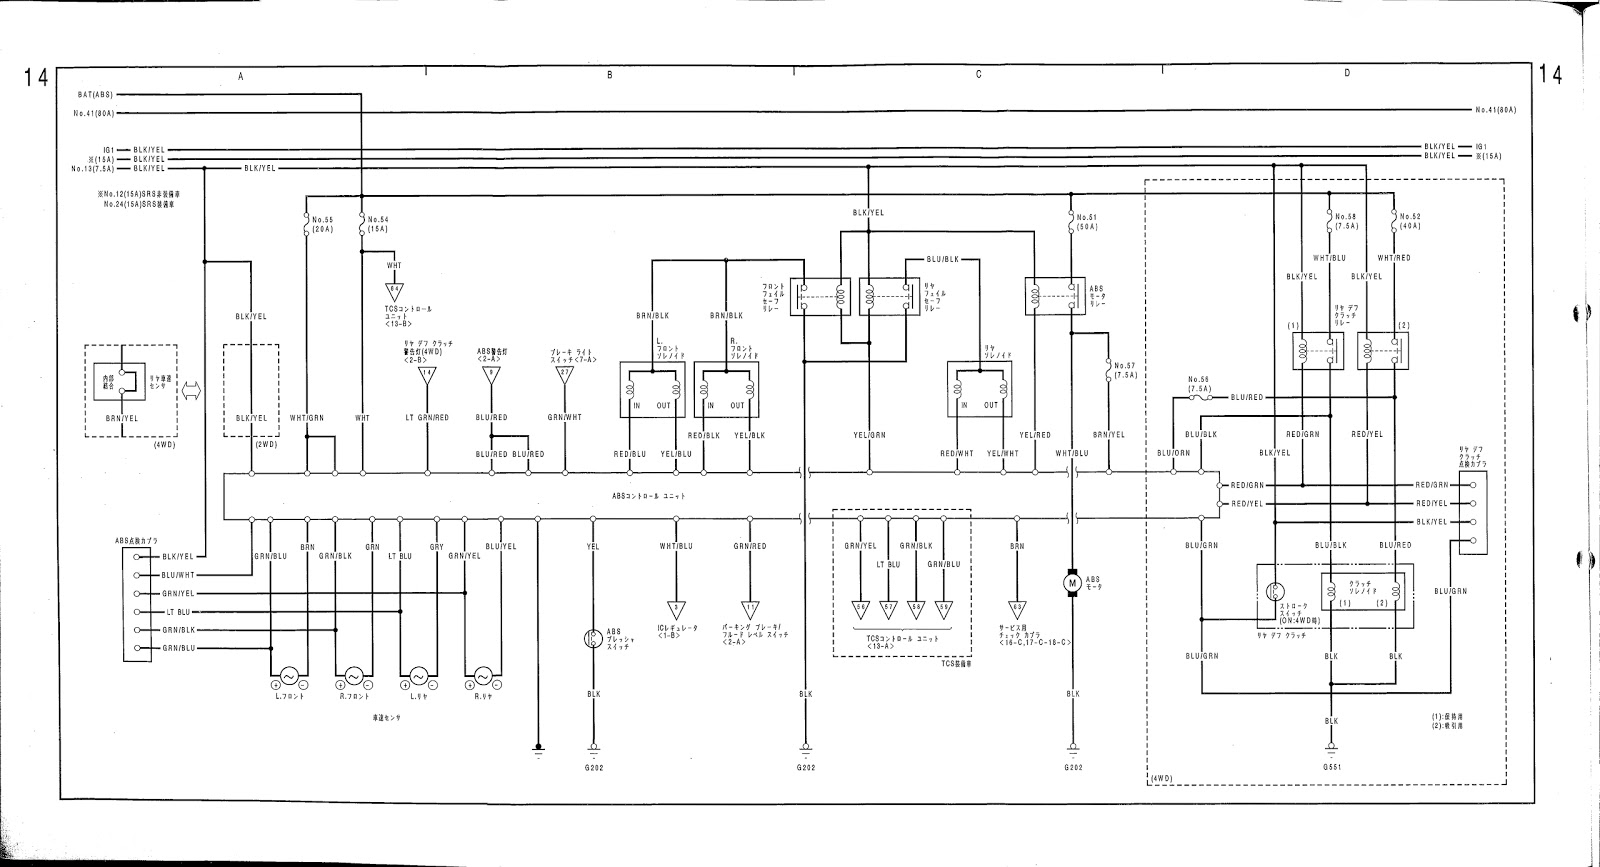 Honda Civic Wiring Diagram Moreover Honda Accord Wiring Diagram